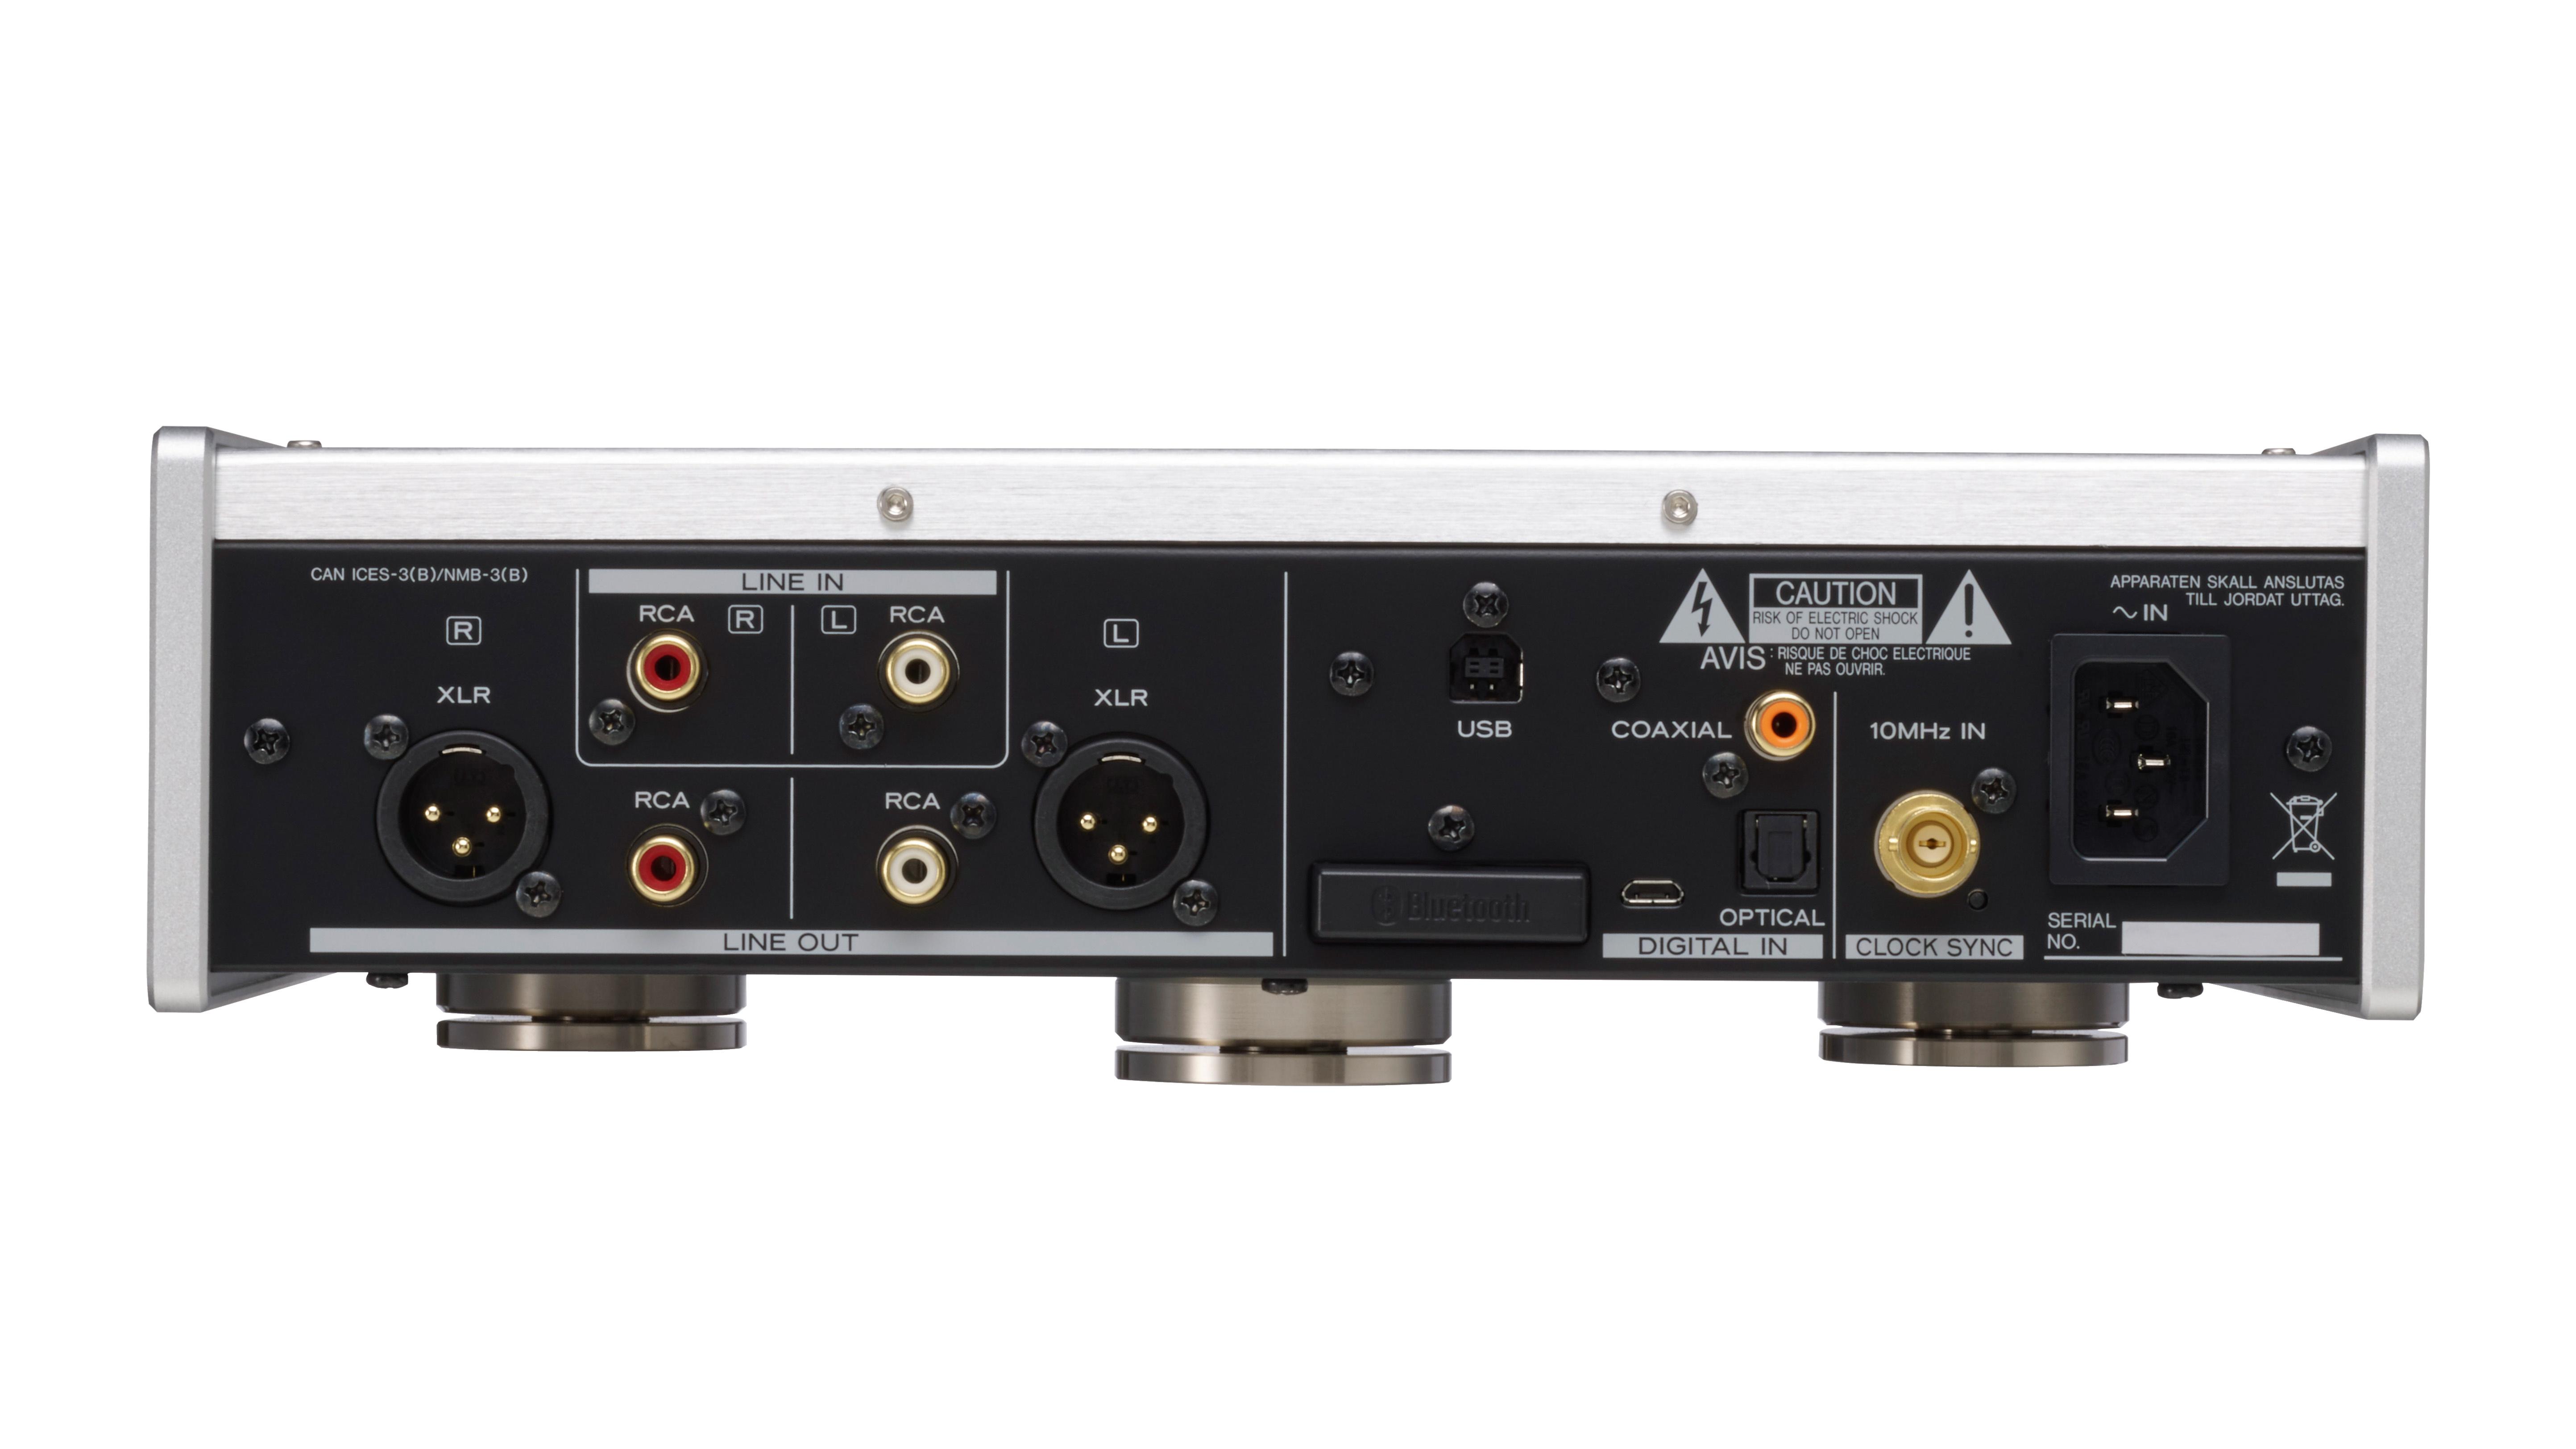 Teac UD-505 USB DAC/Headphone Amplifier